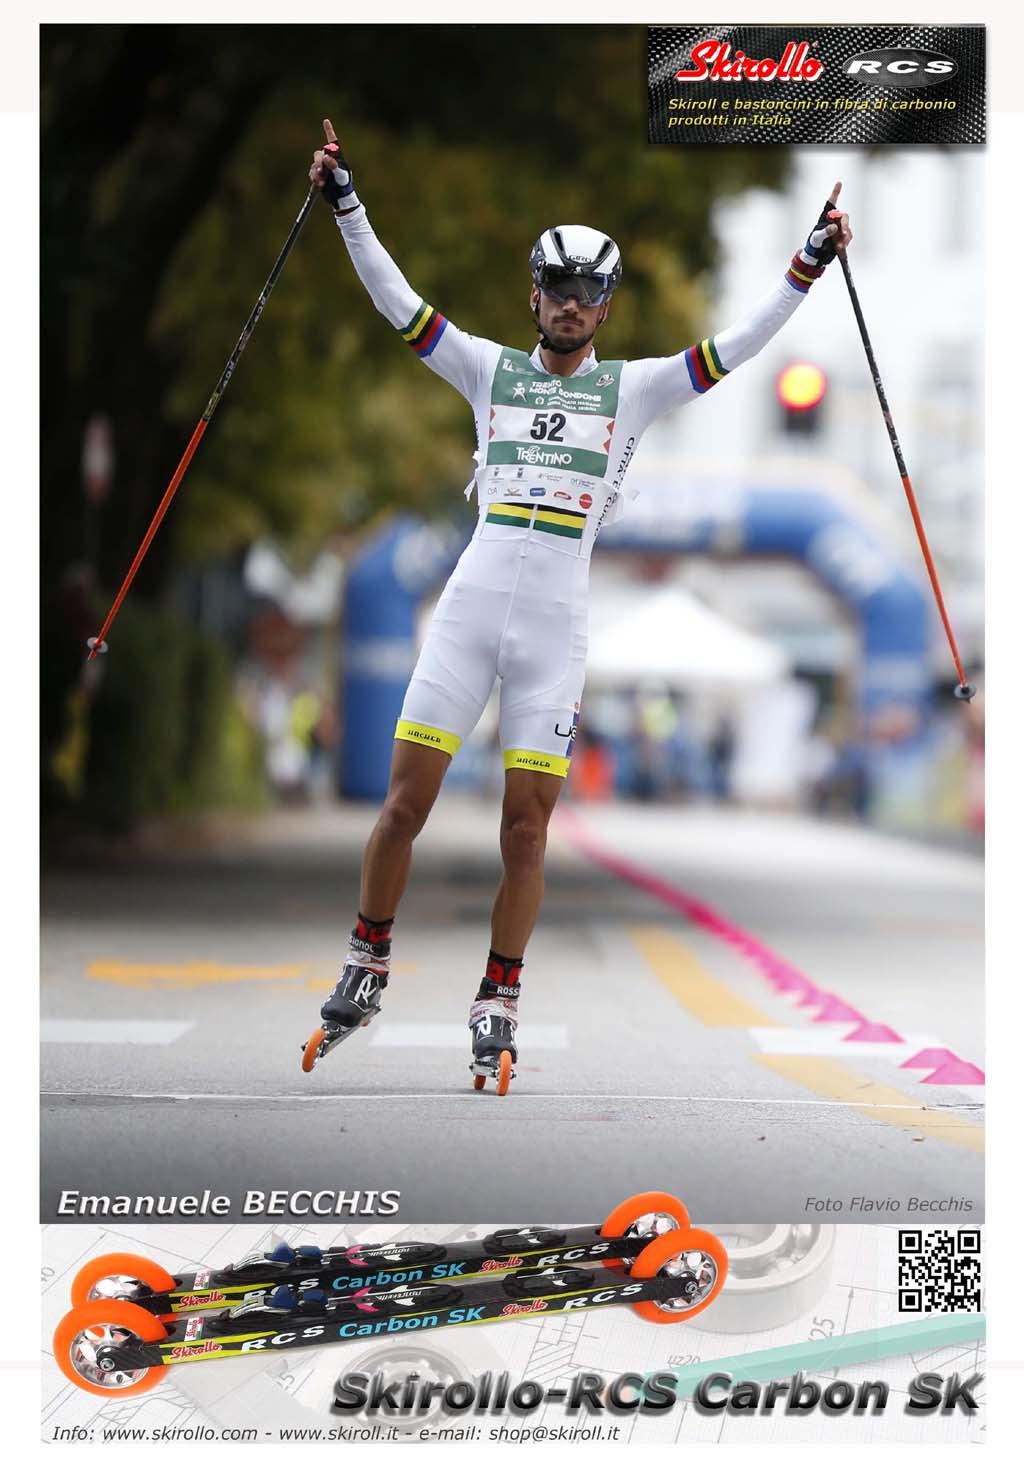 Skirollo-RCS Carbon SK - Emanuele Becchis